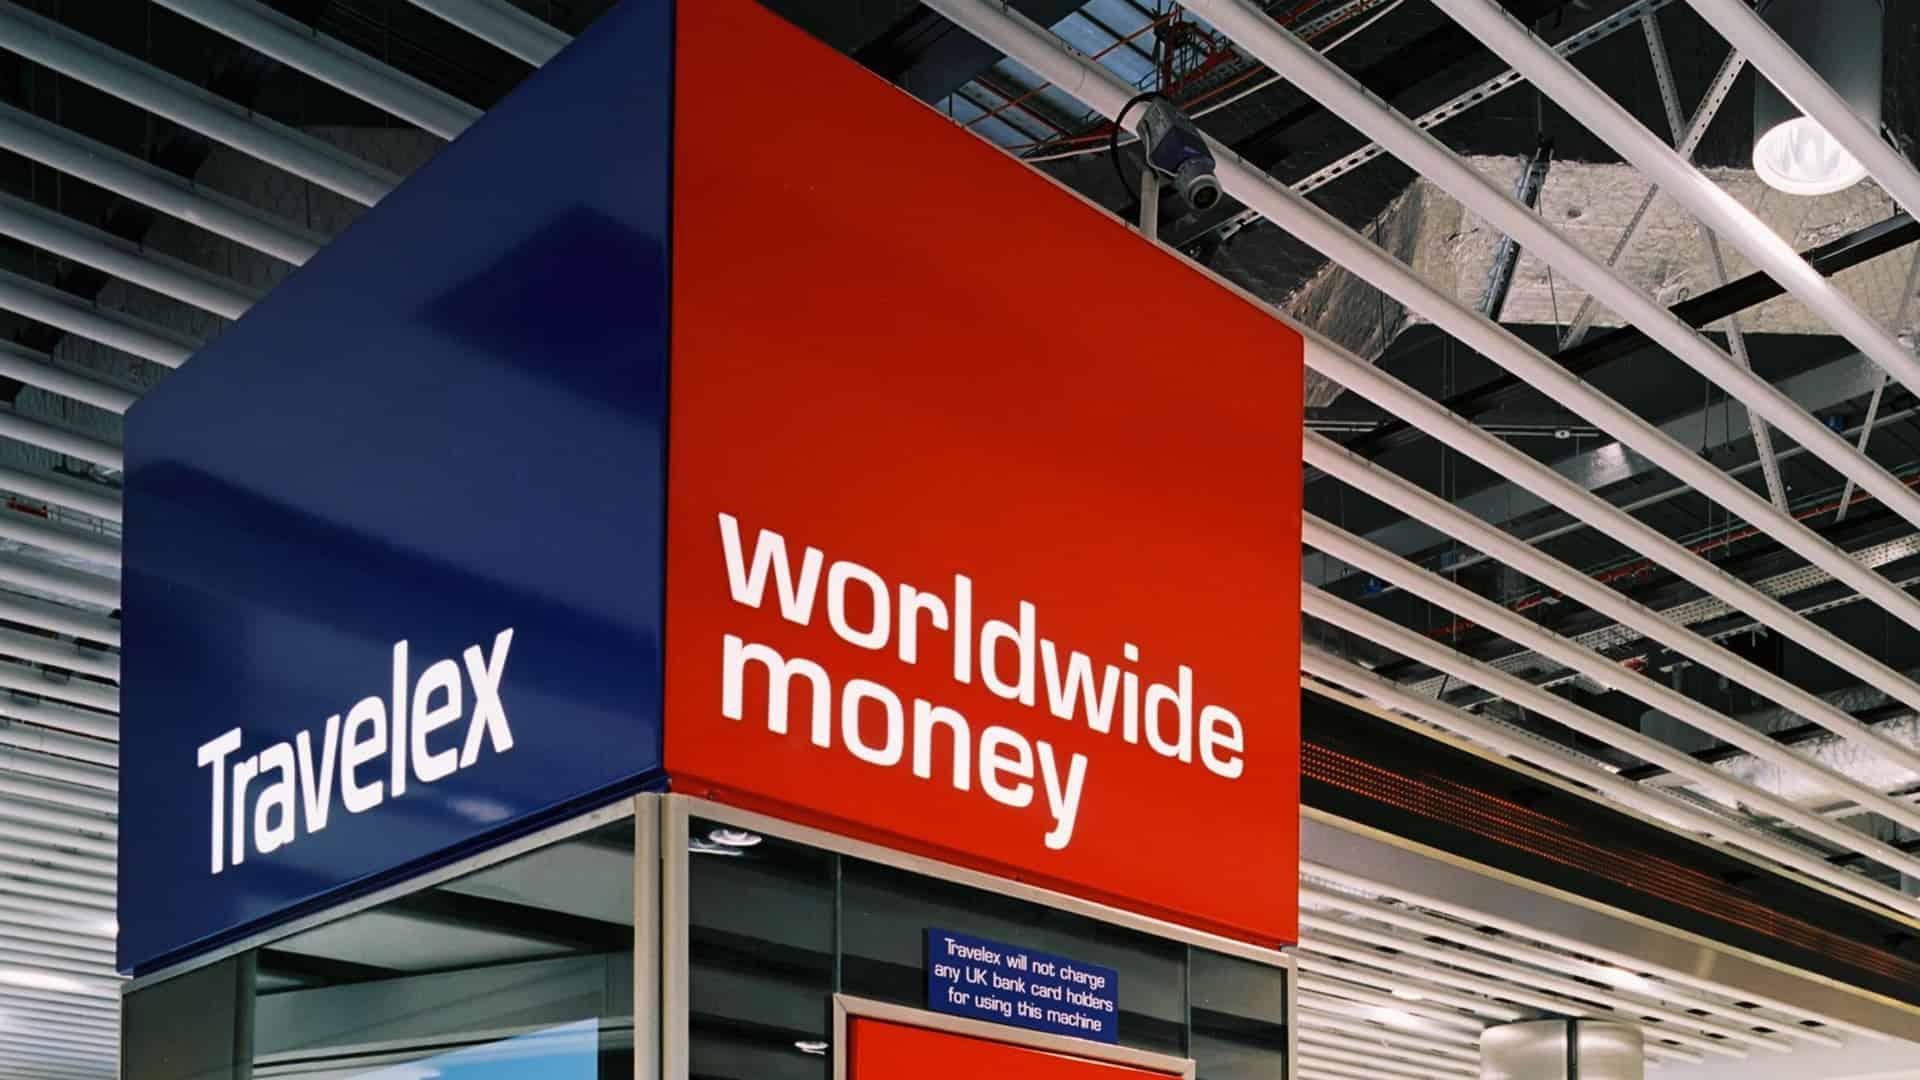 Travelex services offline following massive cyber attack